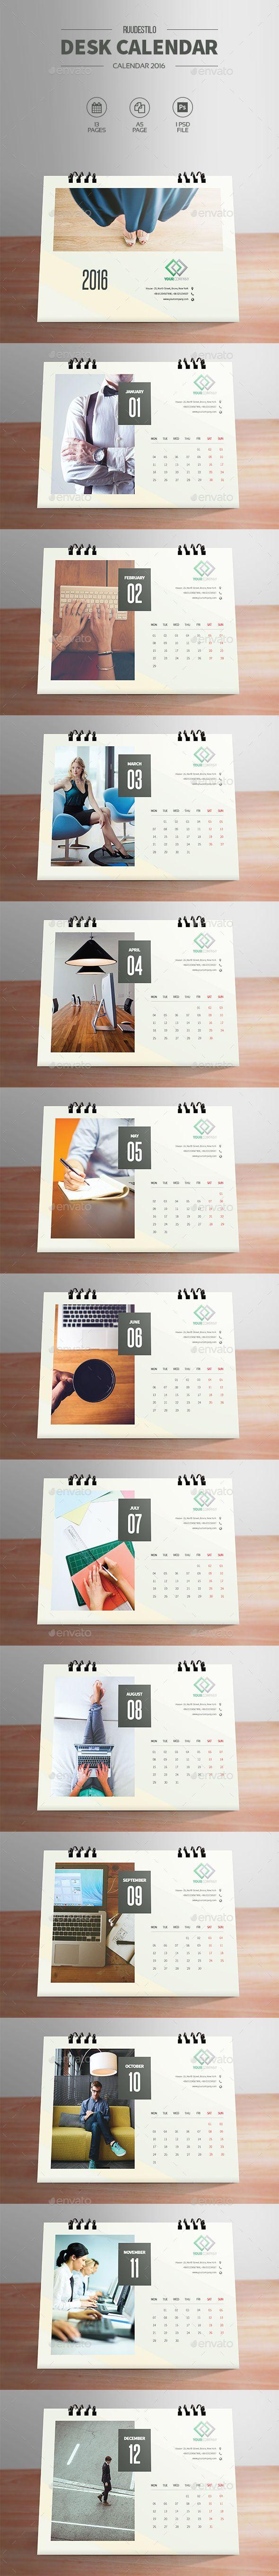 Clean Desktop Calendar 2016, 2017, 2018 - Calendars Stationery